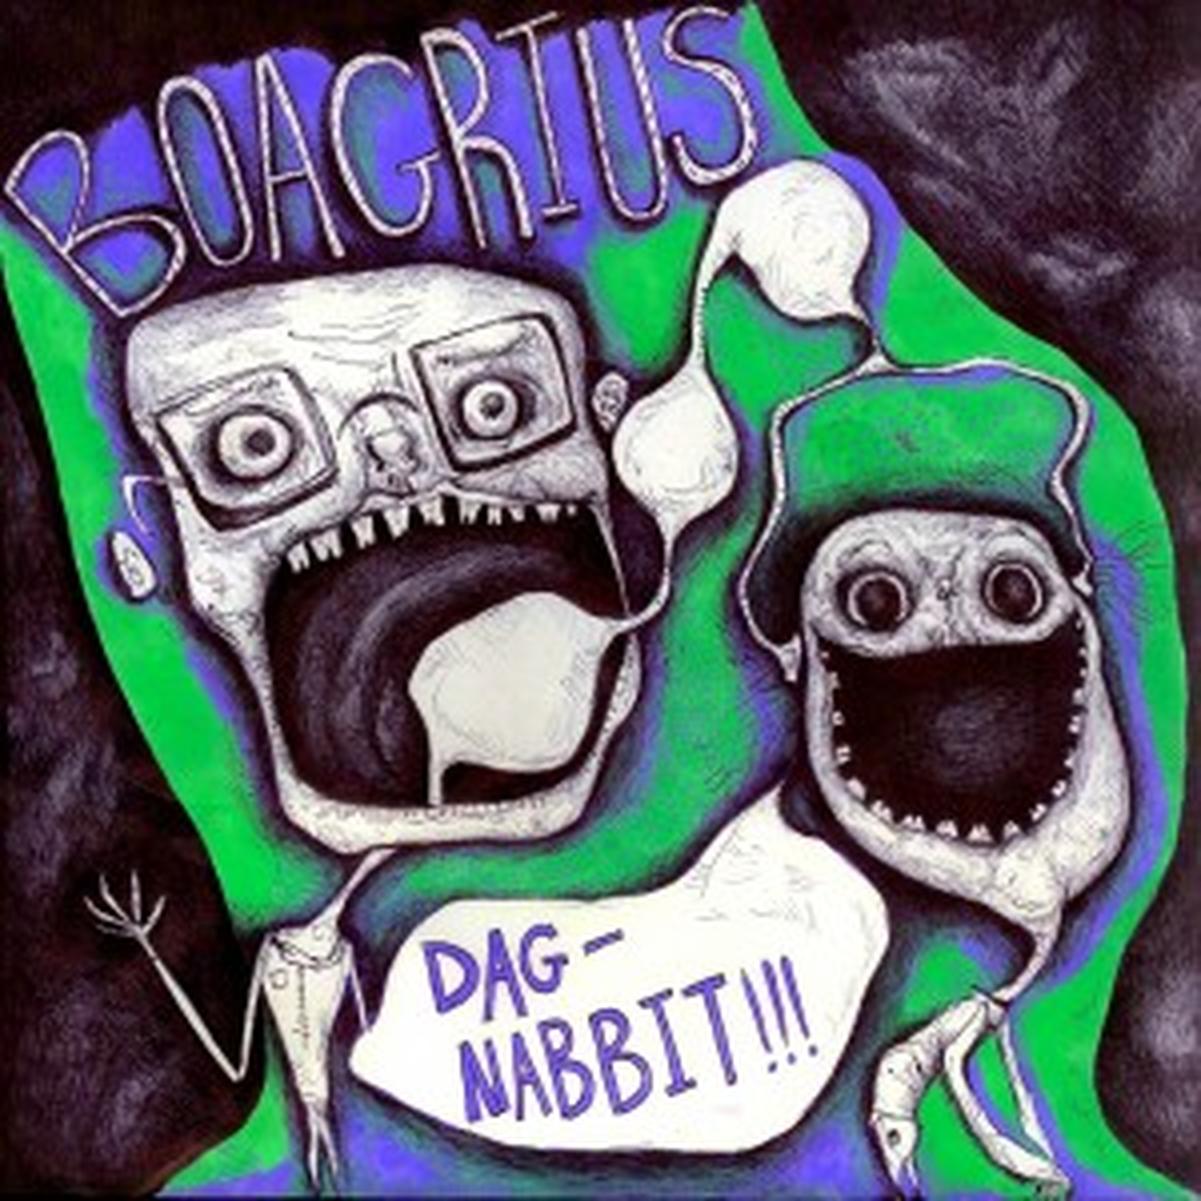 Boagrius wiki, Boagrius review, Boagrius history, Boagrius news